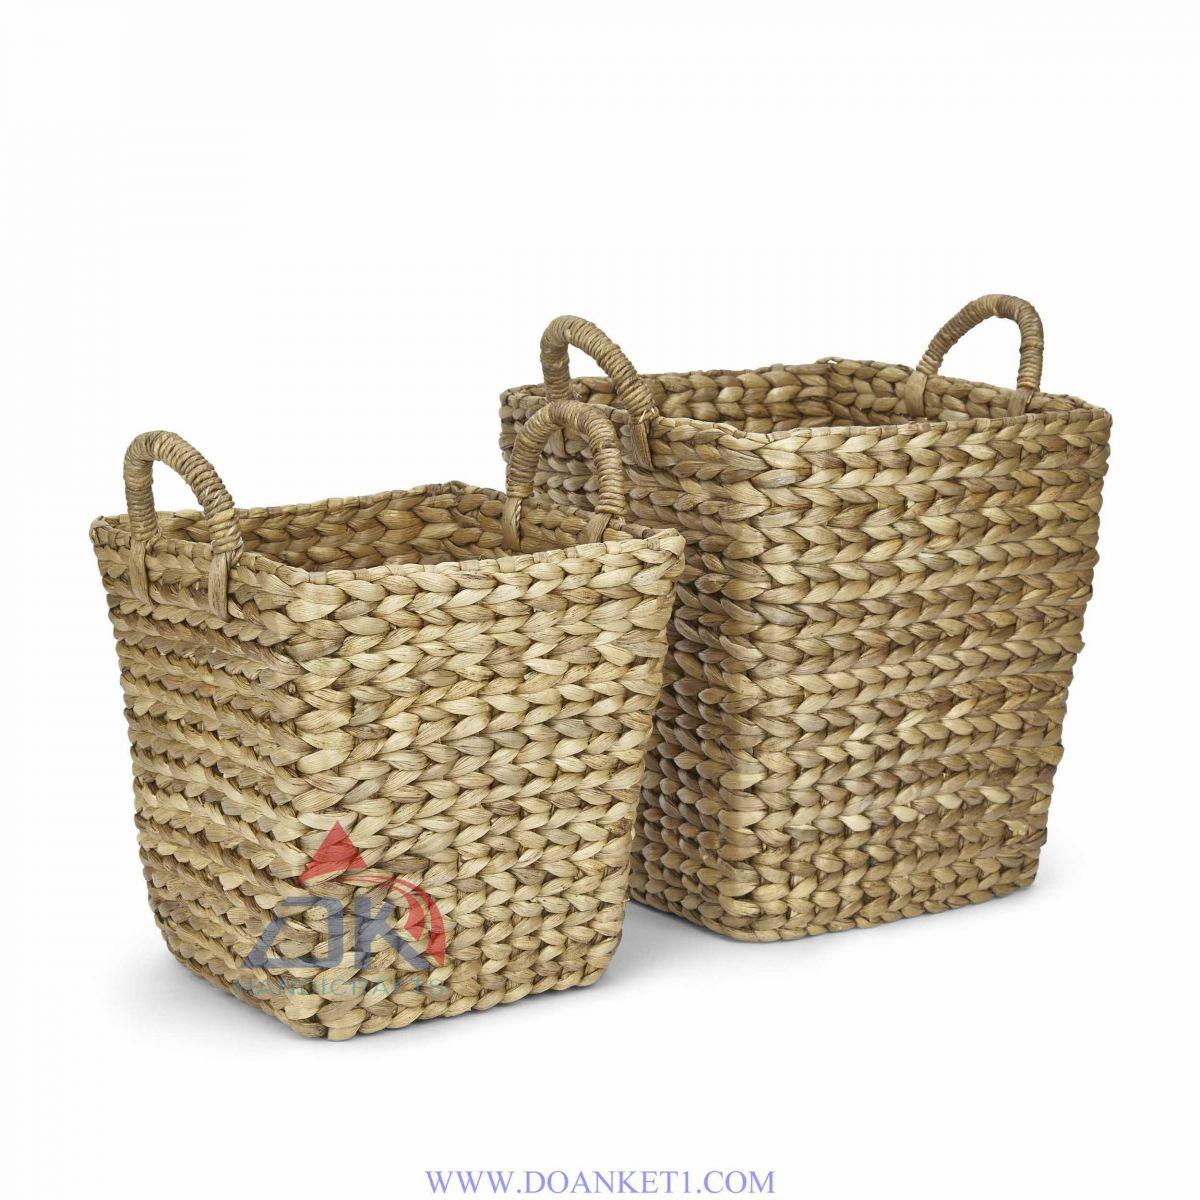 Water Hyacinth Basket S/2 # DK400